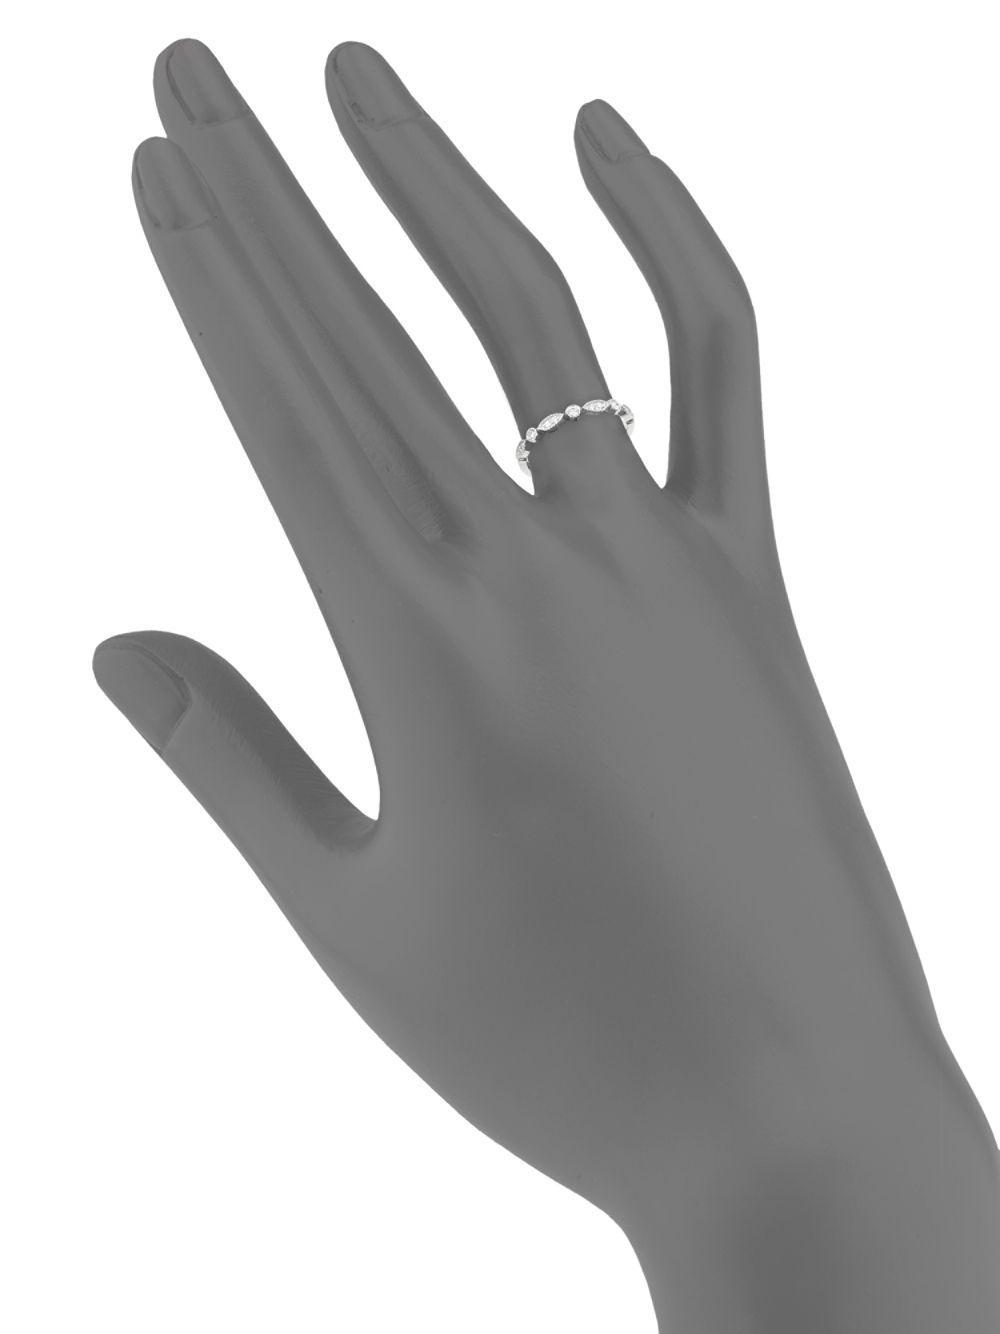 ed1fabb6a1bd7 Lyst - Danni 14k White Gold Milgrain Diamond Ring in Metallic